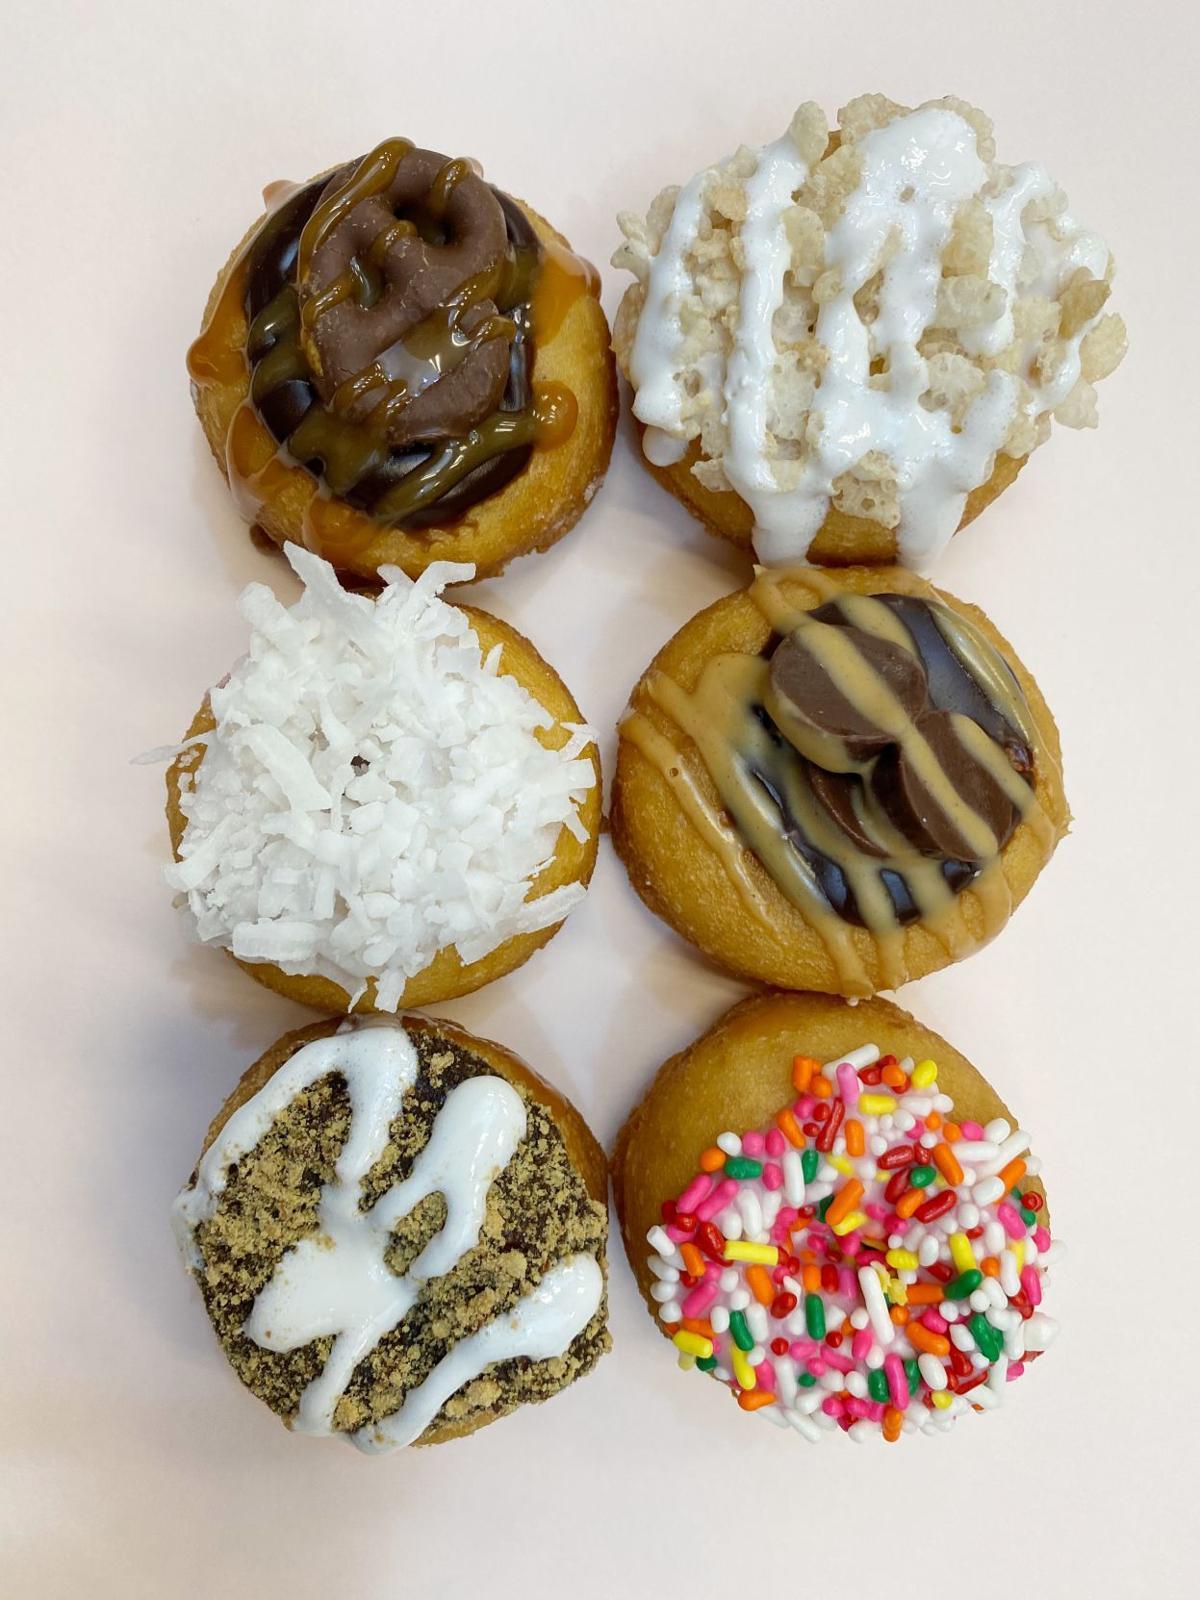 Charlie's Mini Donuts  & Coffee